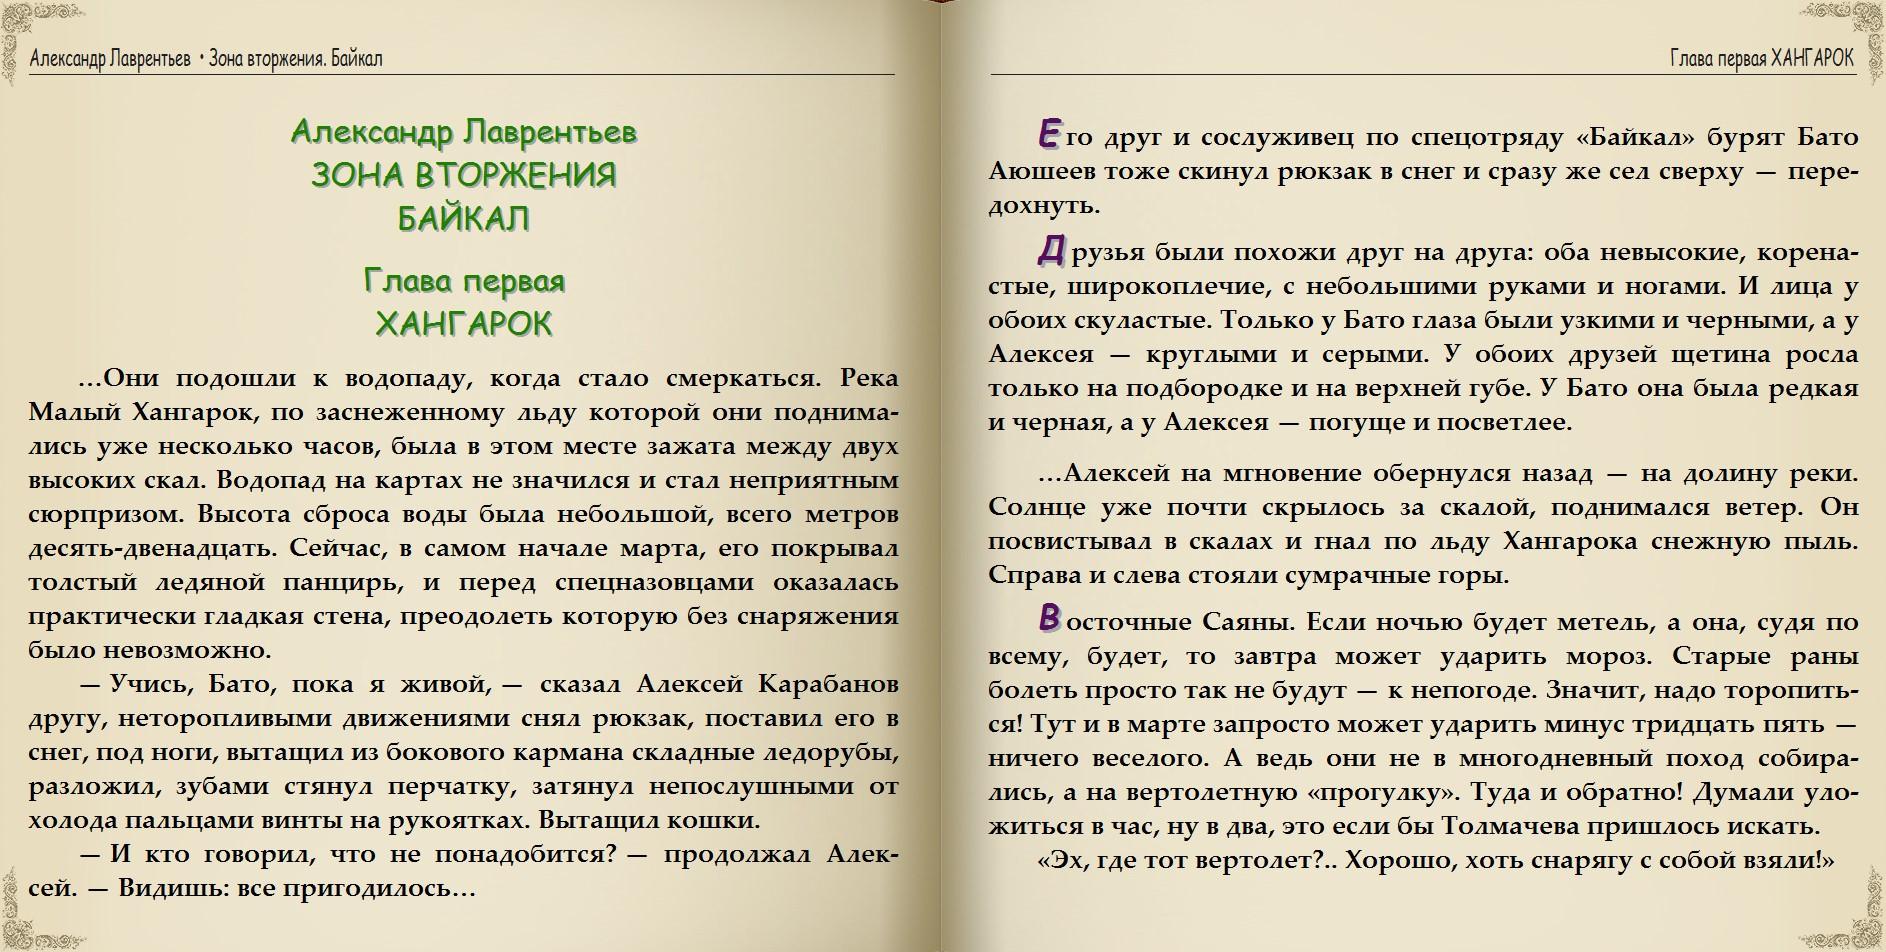 http://i5.imageban.ru/out/2014/09/10/d2048a4657d01fc9e91ef86cbc9ce106.jpg